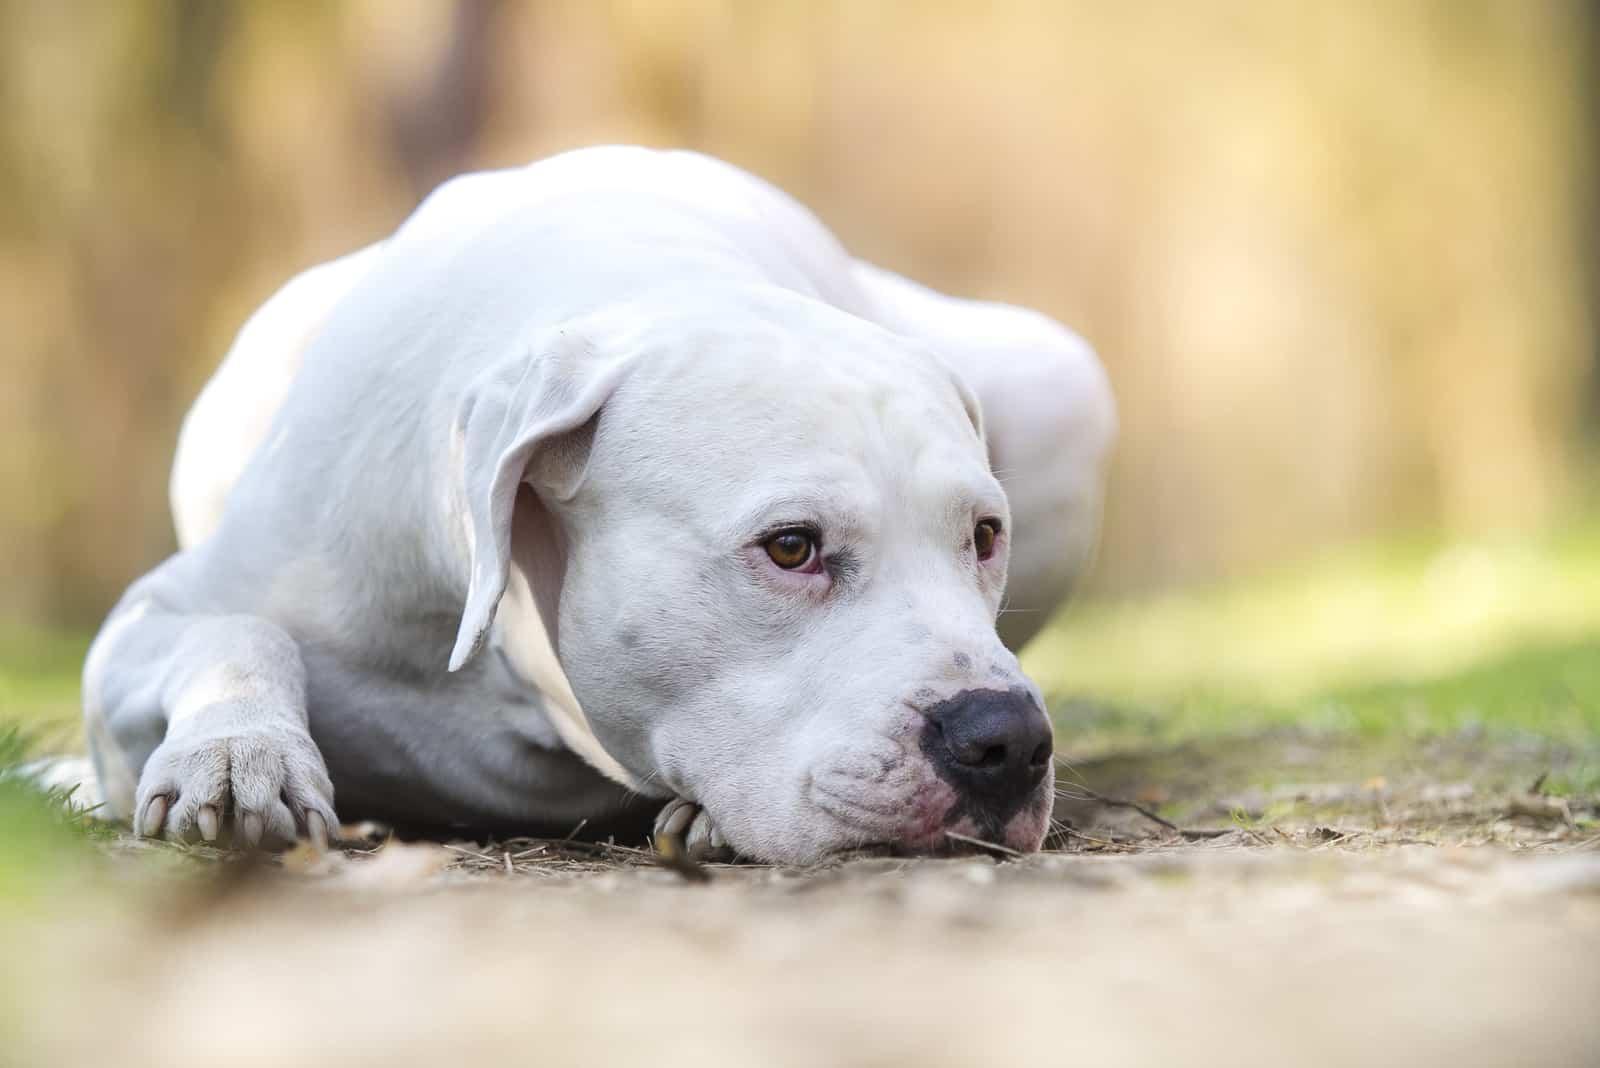 dogo argentino lying on the ground